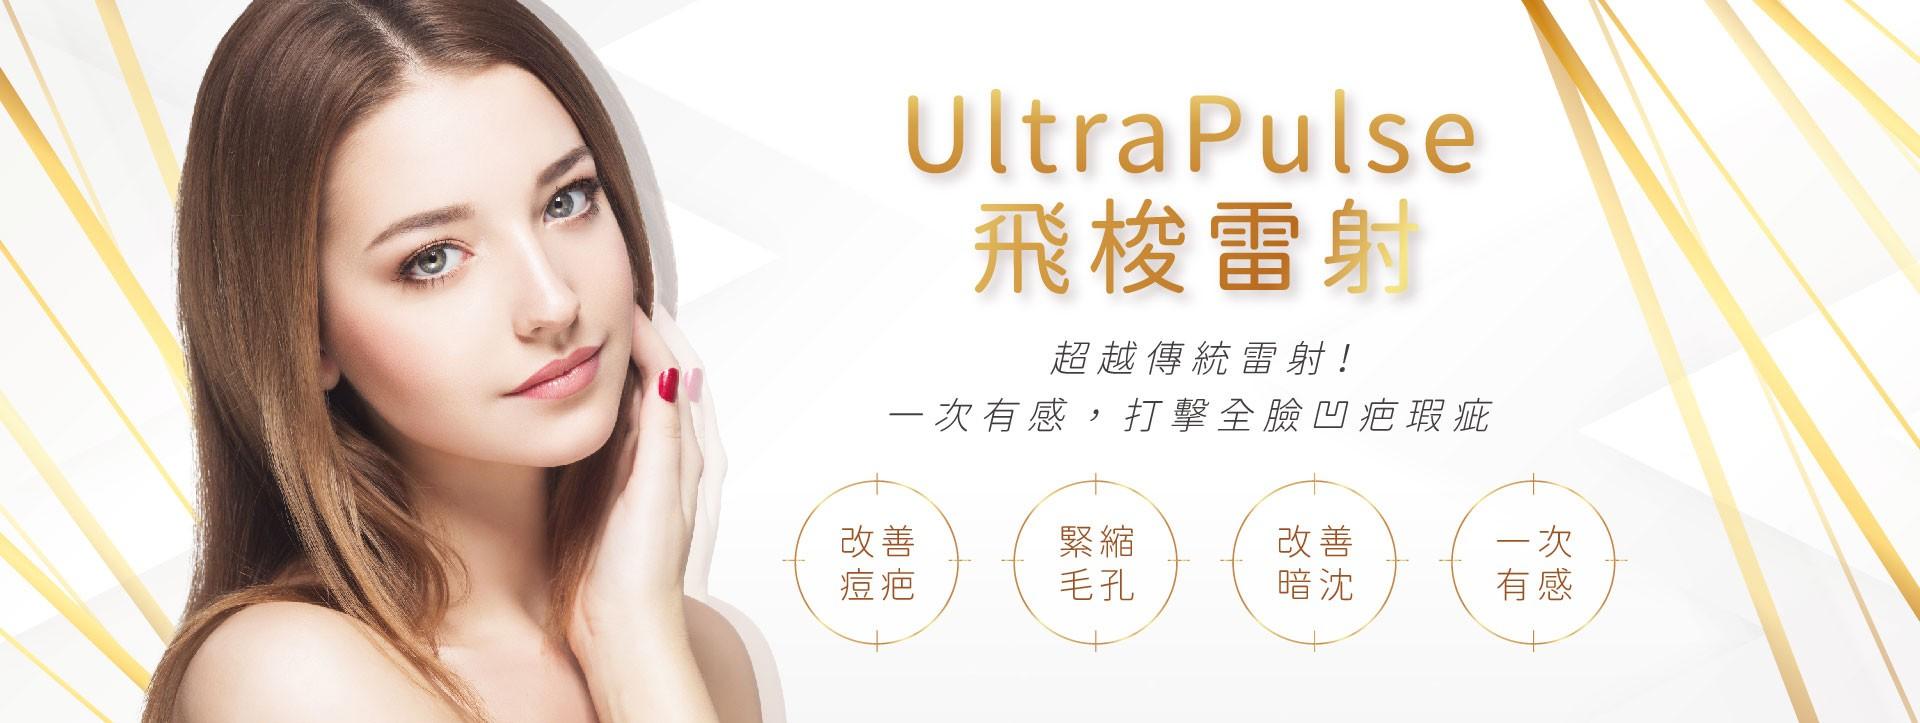 UltraPulse 飛梭雷射